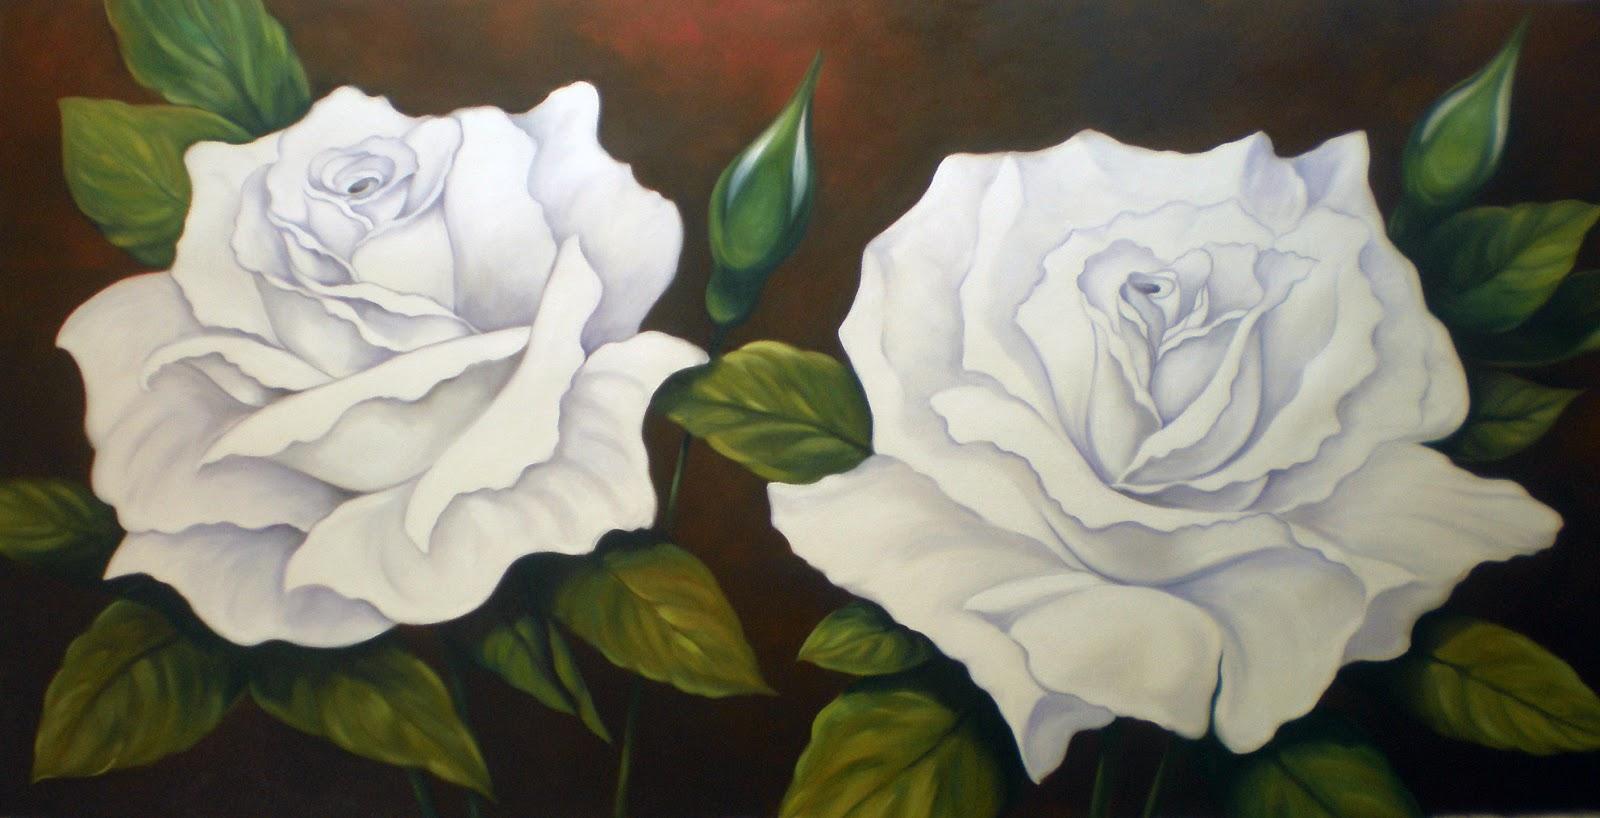 Antonio Luque Rosas Blancas